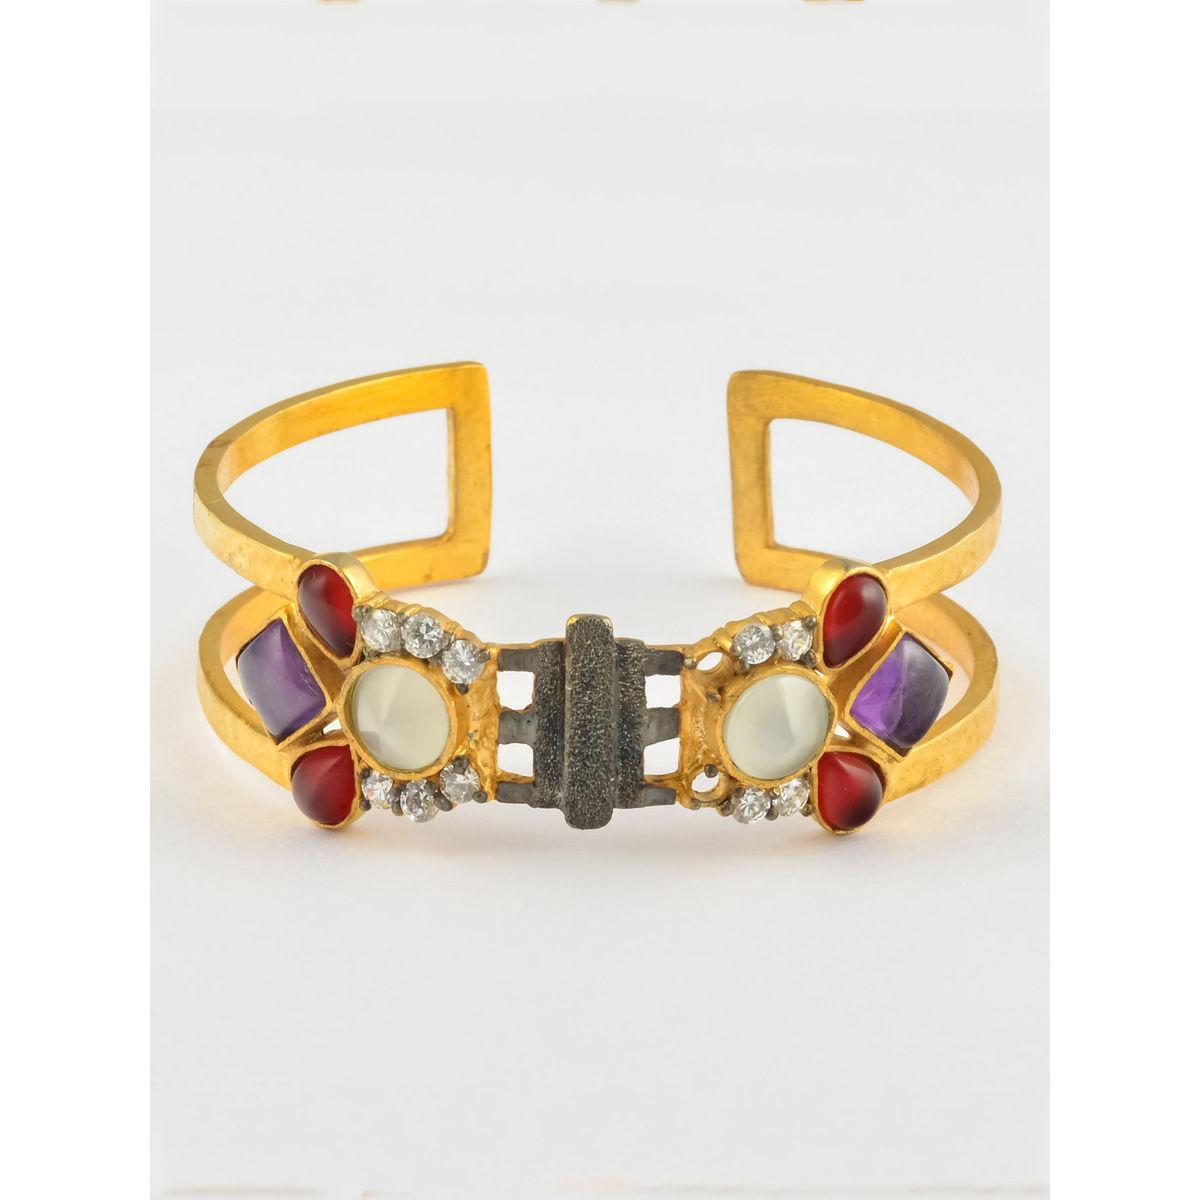 Alchemilla semi precious metal bracelet